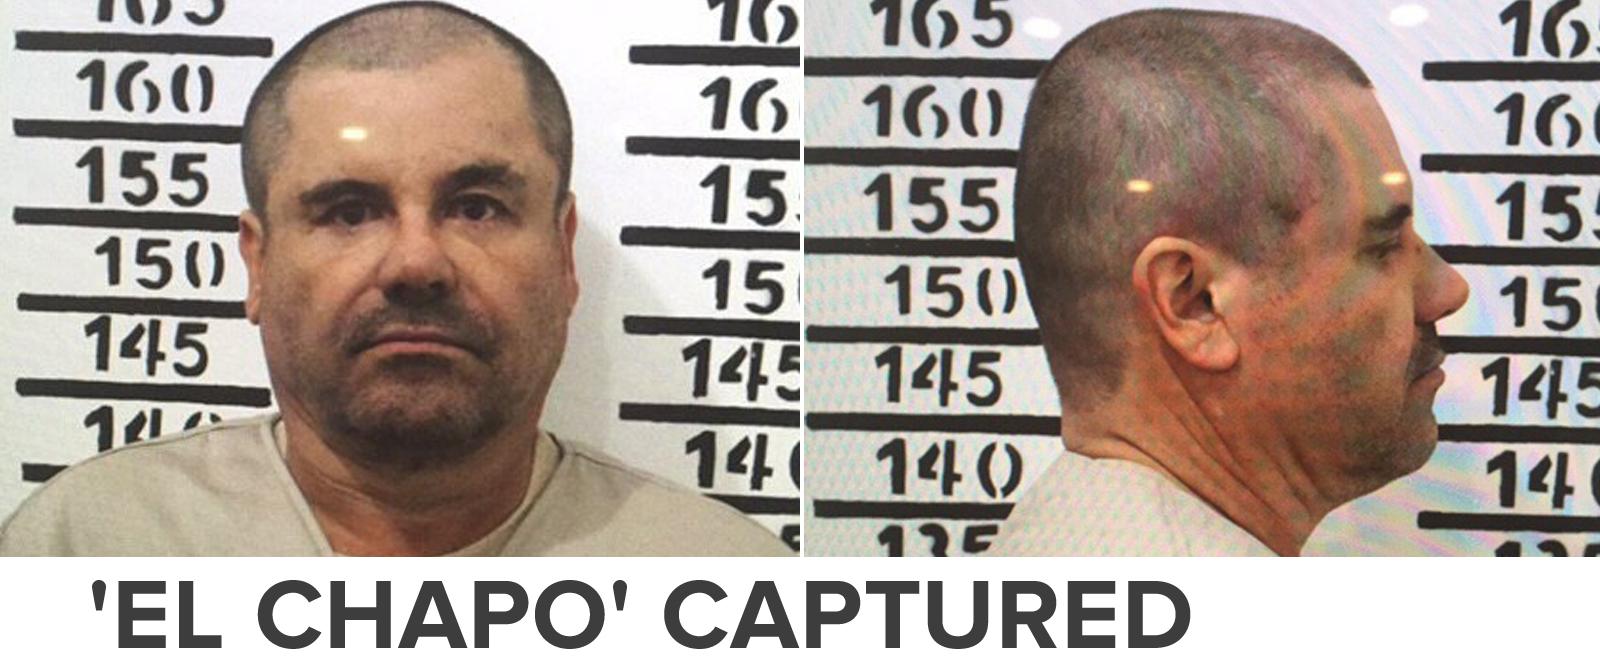 Joaquin El Chapo Guzman